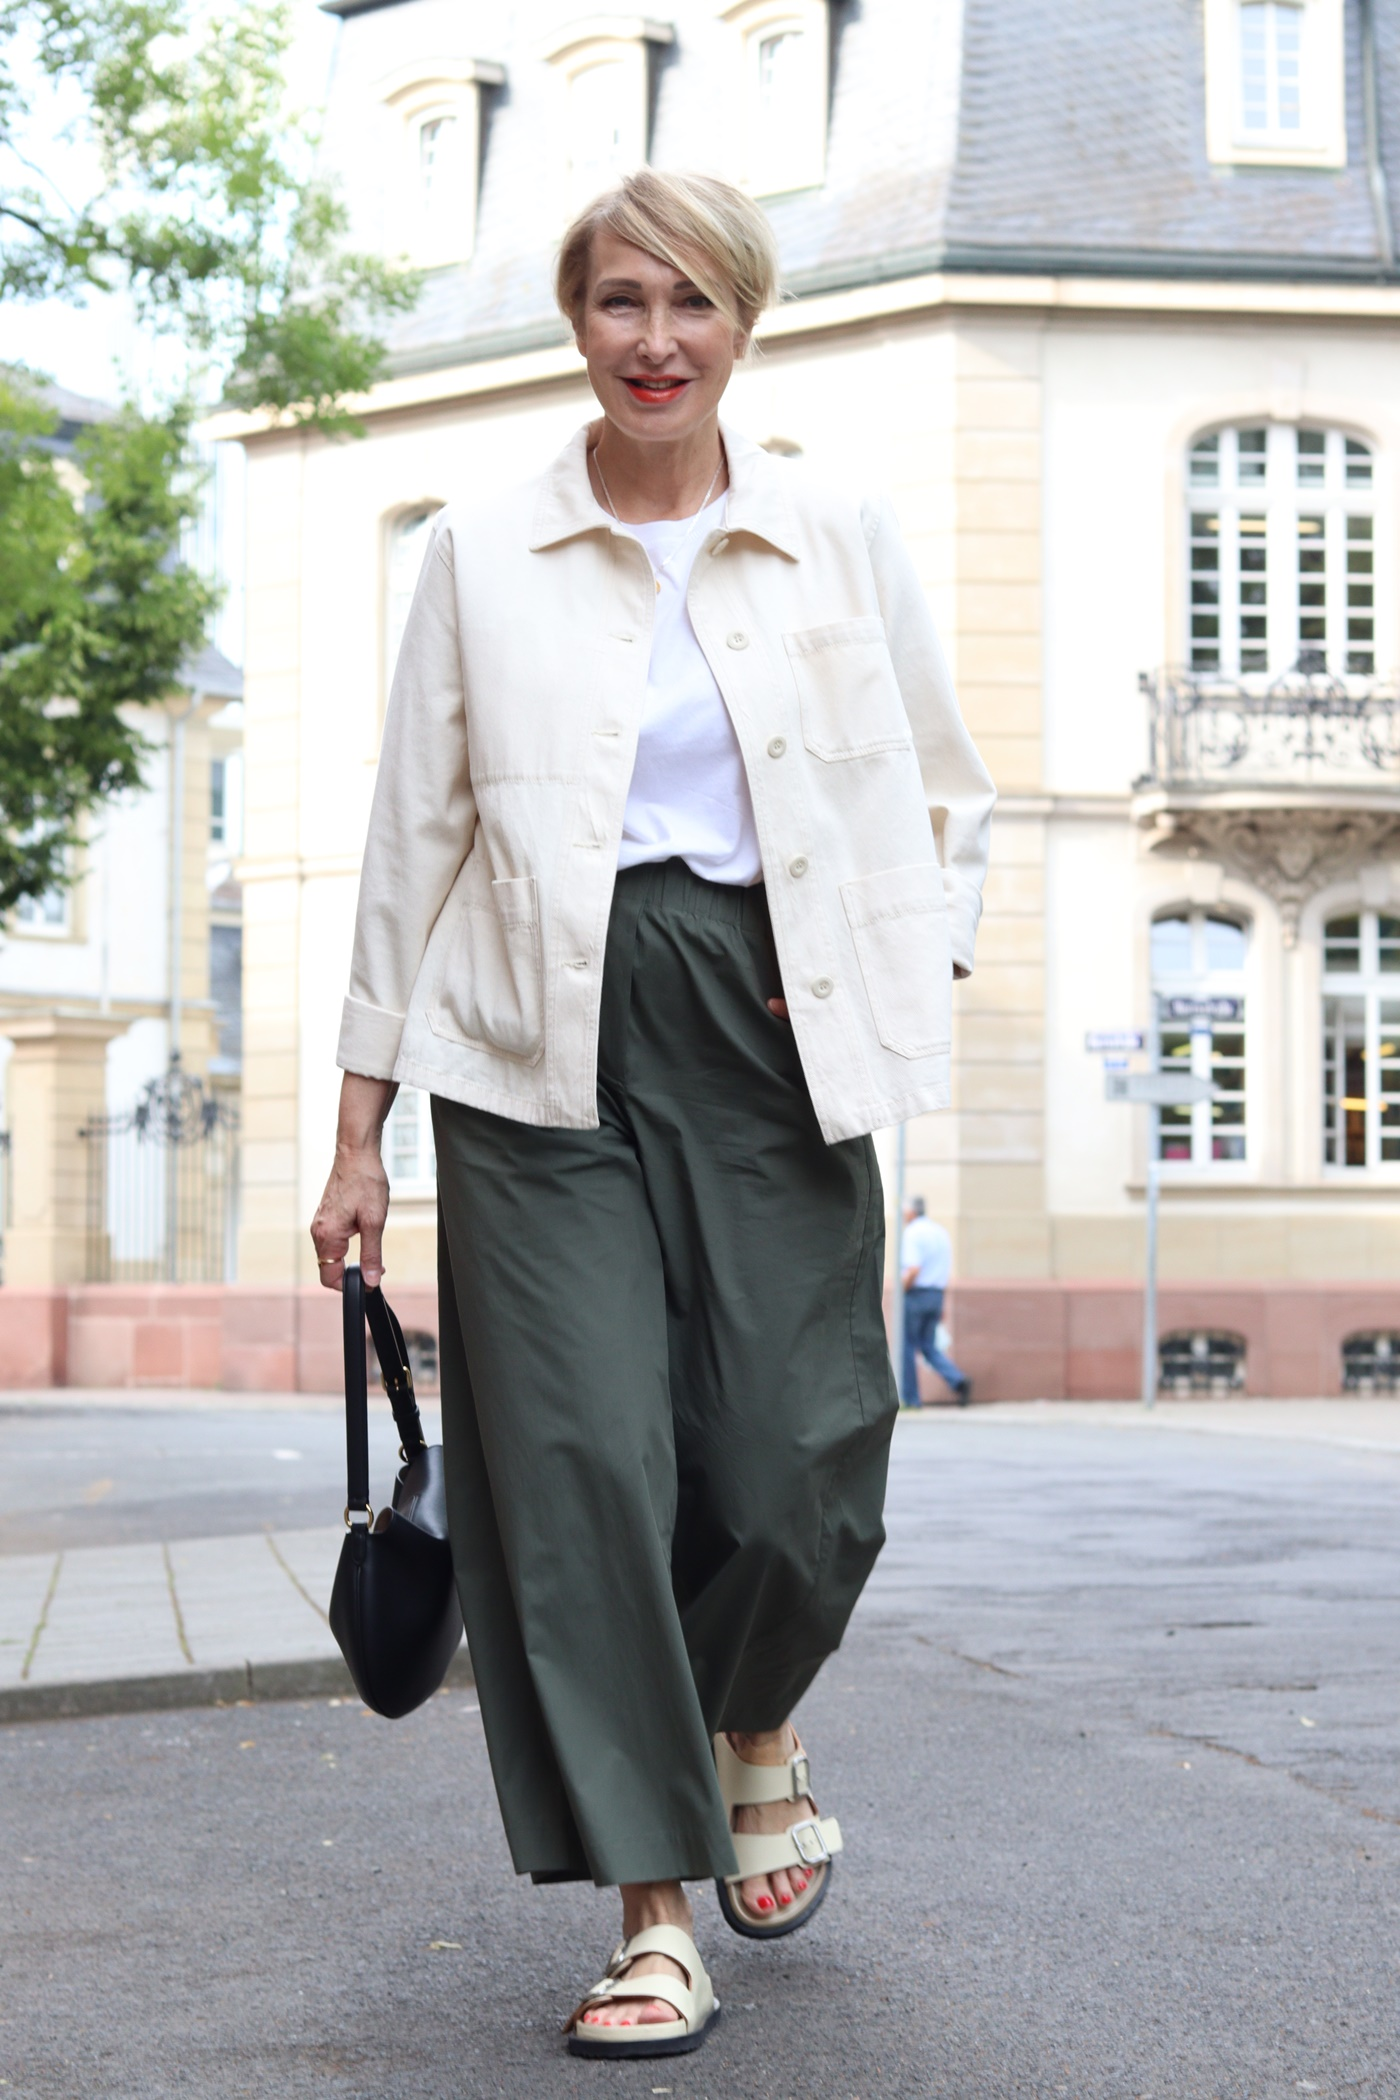 glamupyourlifestyle weekend-max-mara instagram ue-40-mode ue-40-blog birkenstock-Jil-Sander